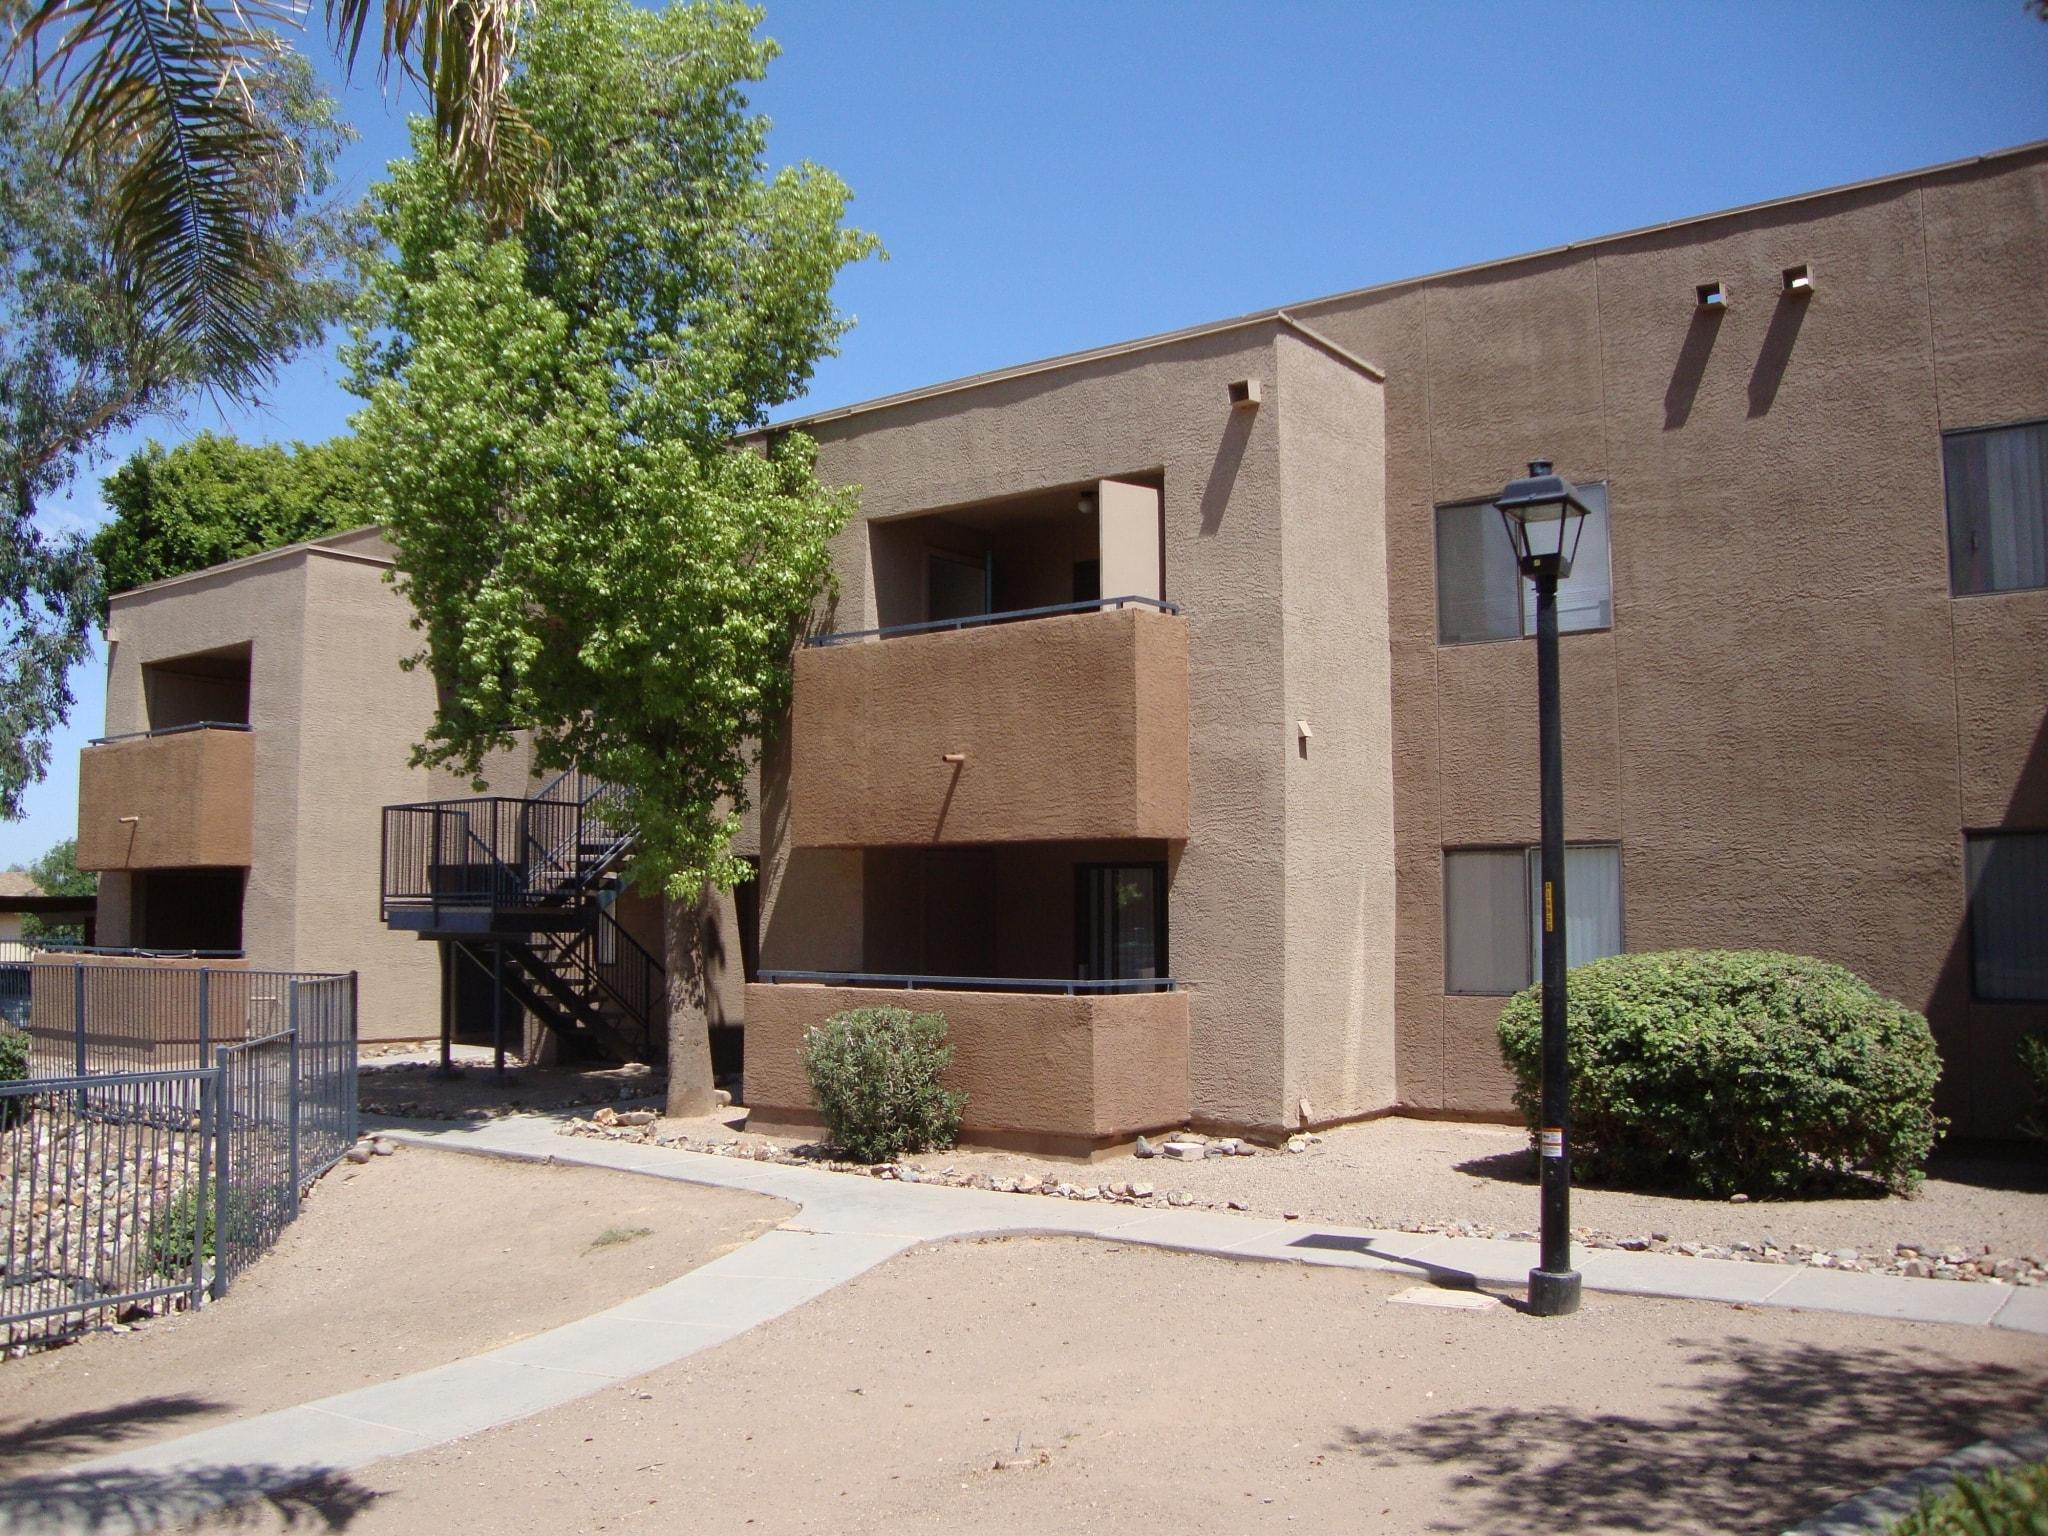 Summerhill Place Apartments rental